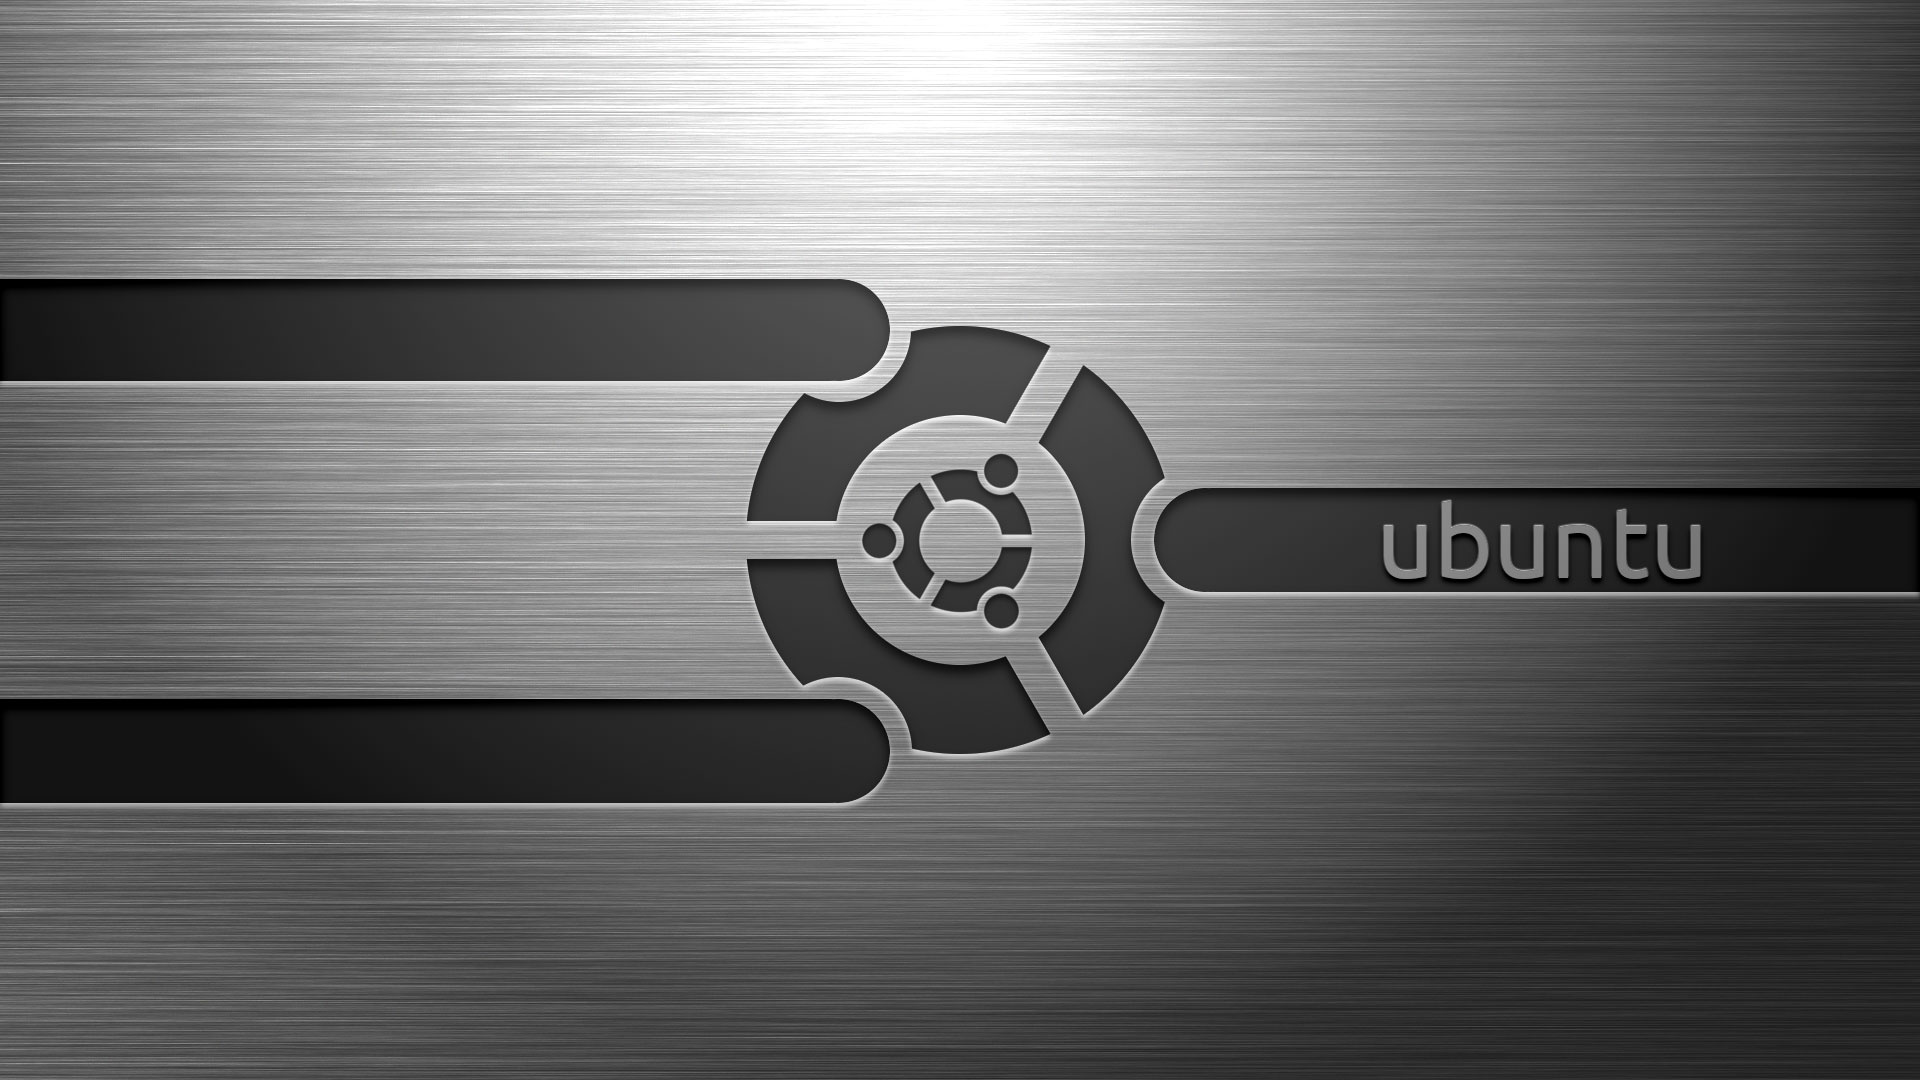 How to Optimize Your Ubuntu's Performance